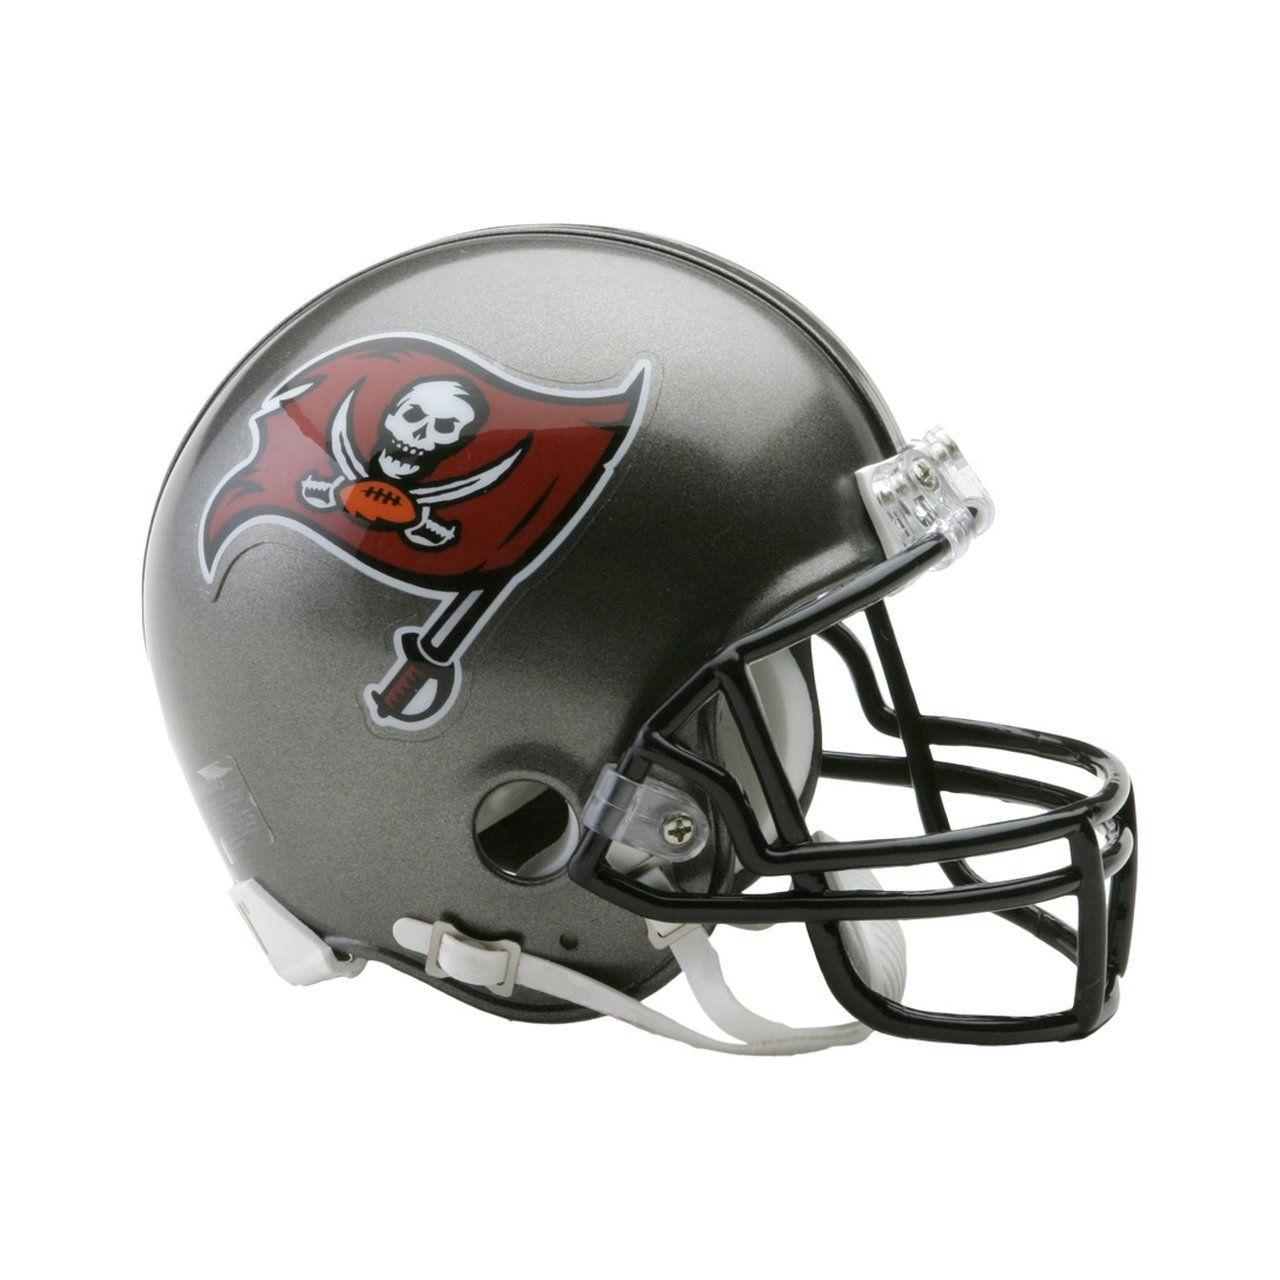 amfoo - Riddell VSR4 Mini Football Helm - Tampa Bay Buccaneers 97-13